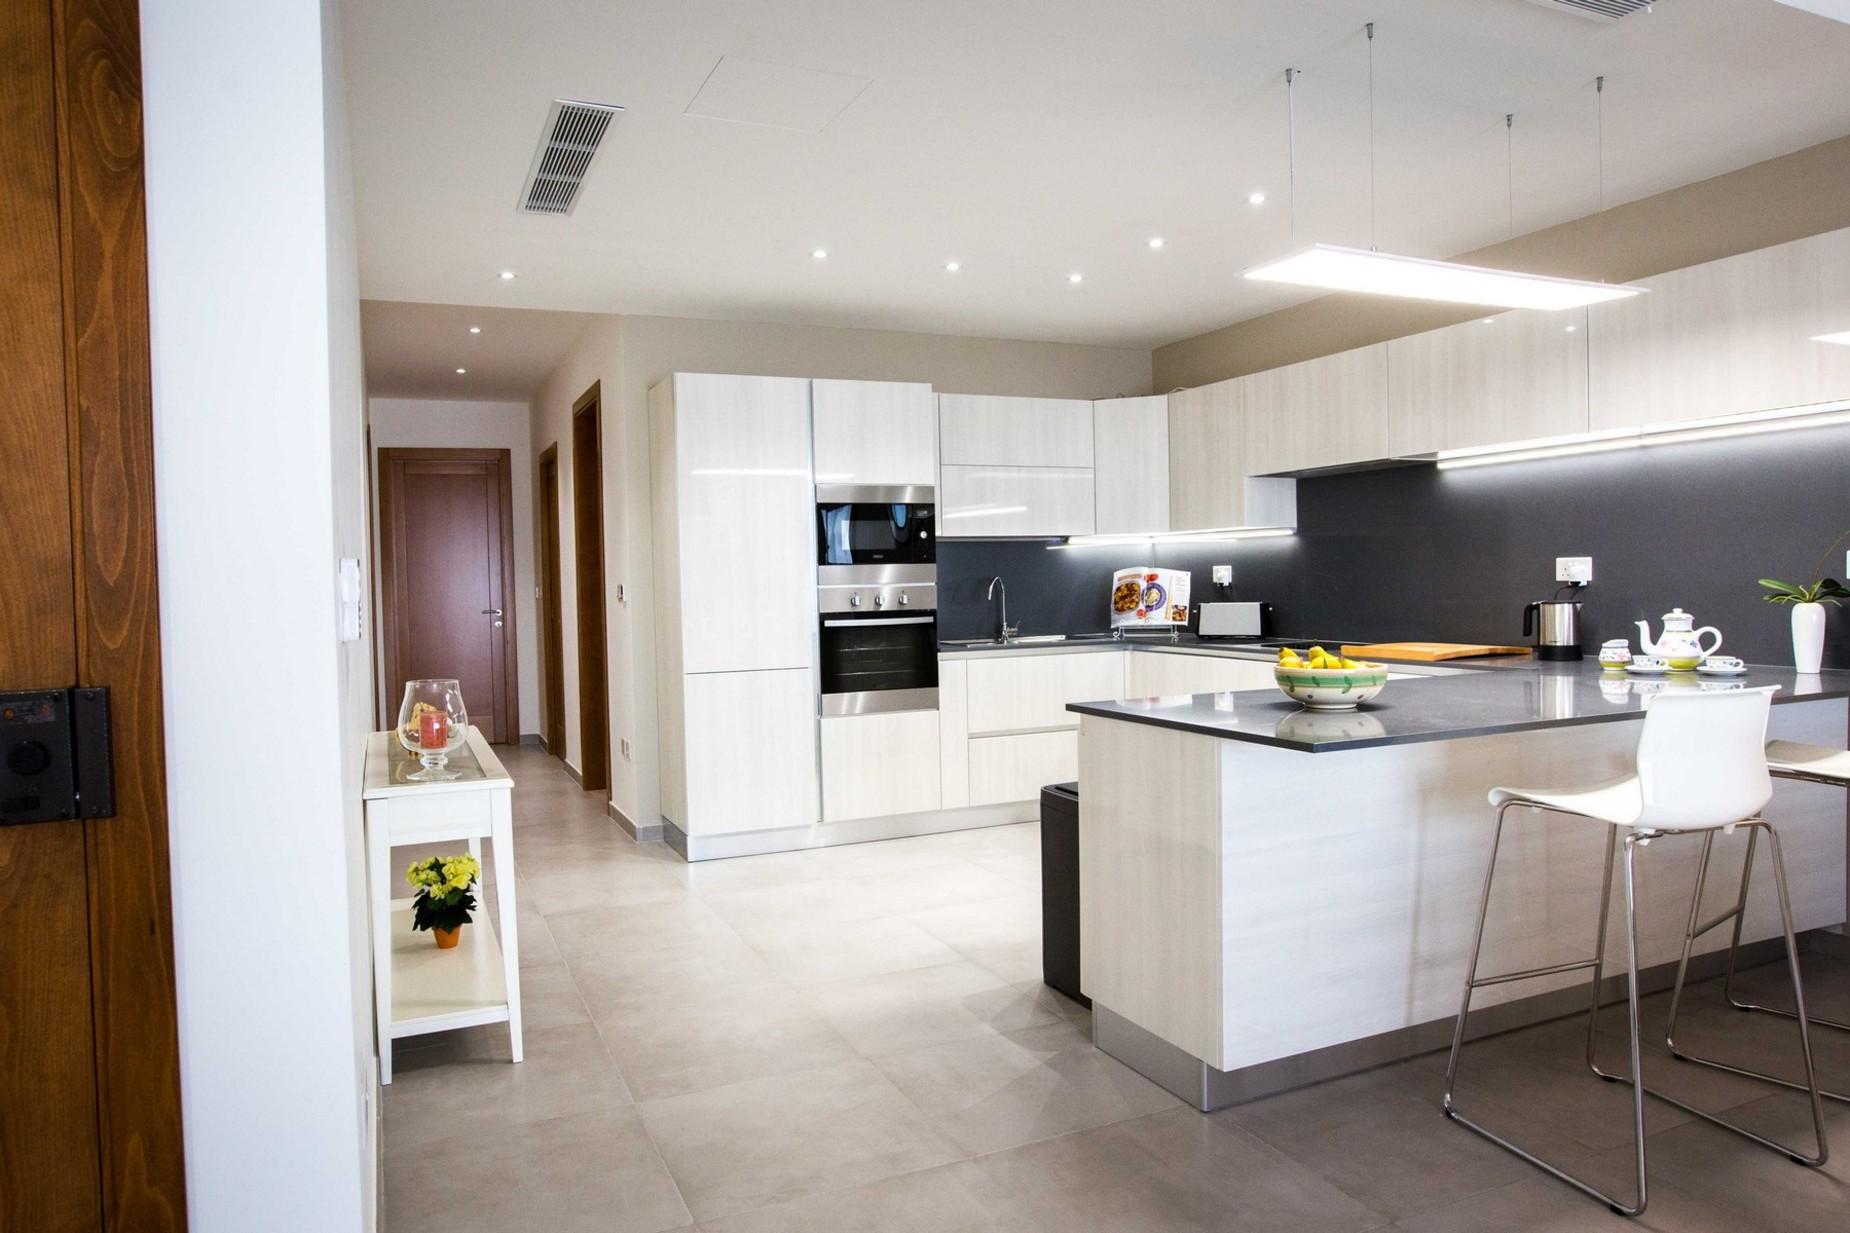 0 bed Apartment For Rent in Naxxar, Naxxar - thumb 3